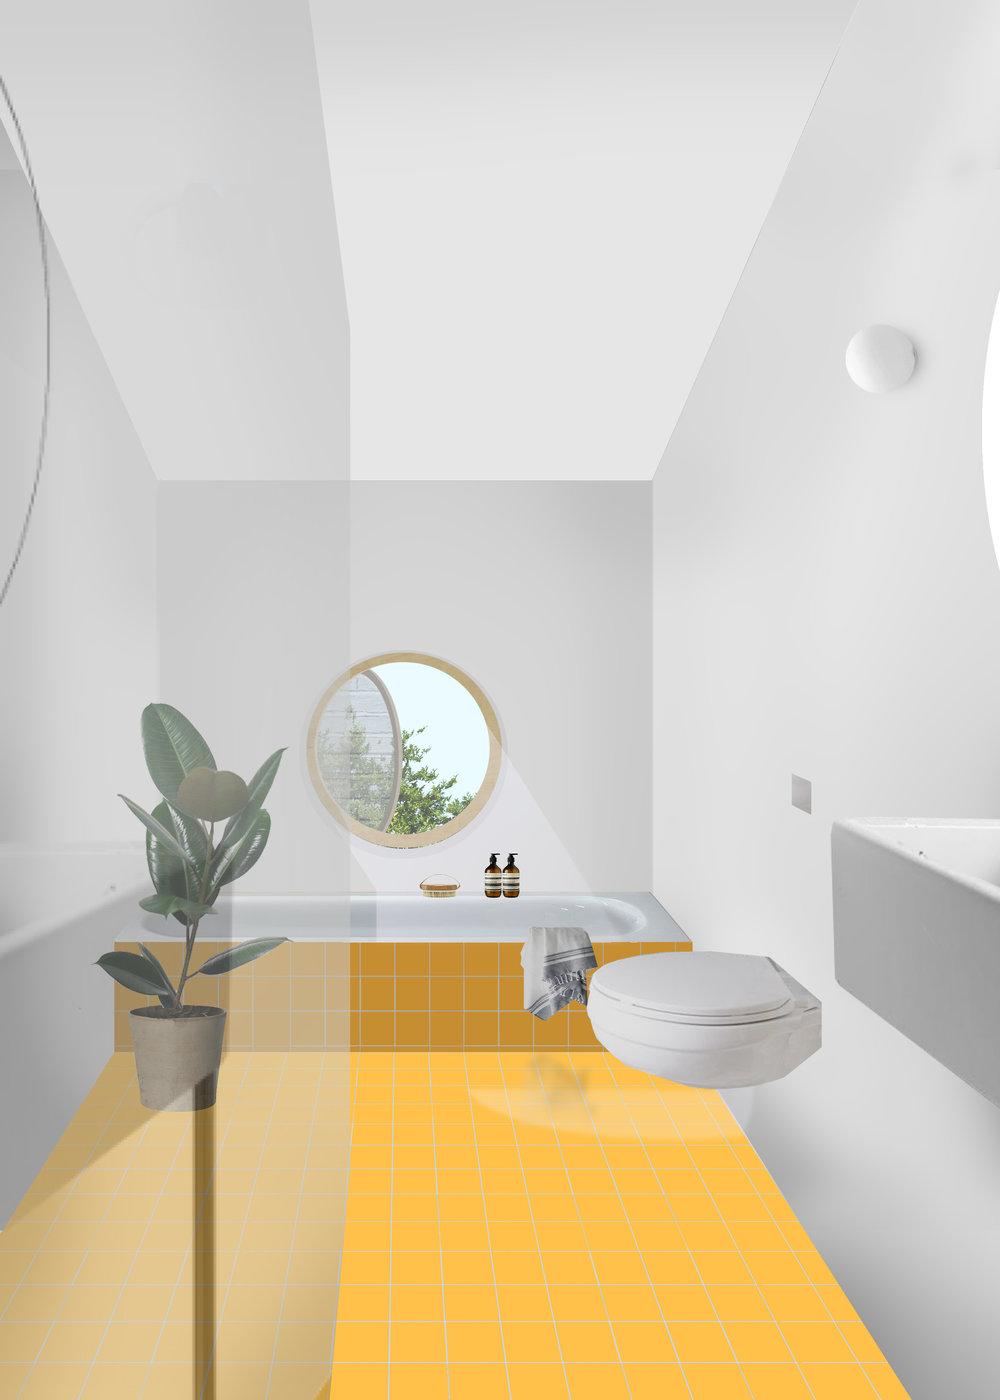 086_Bathroom.jpg